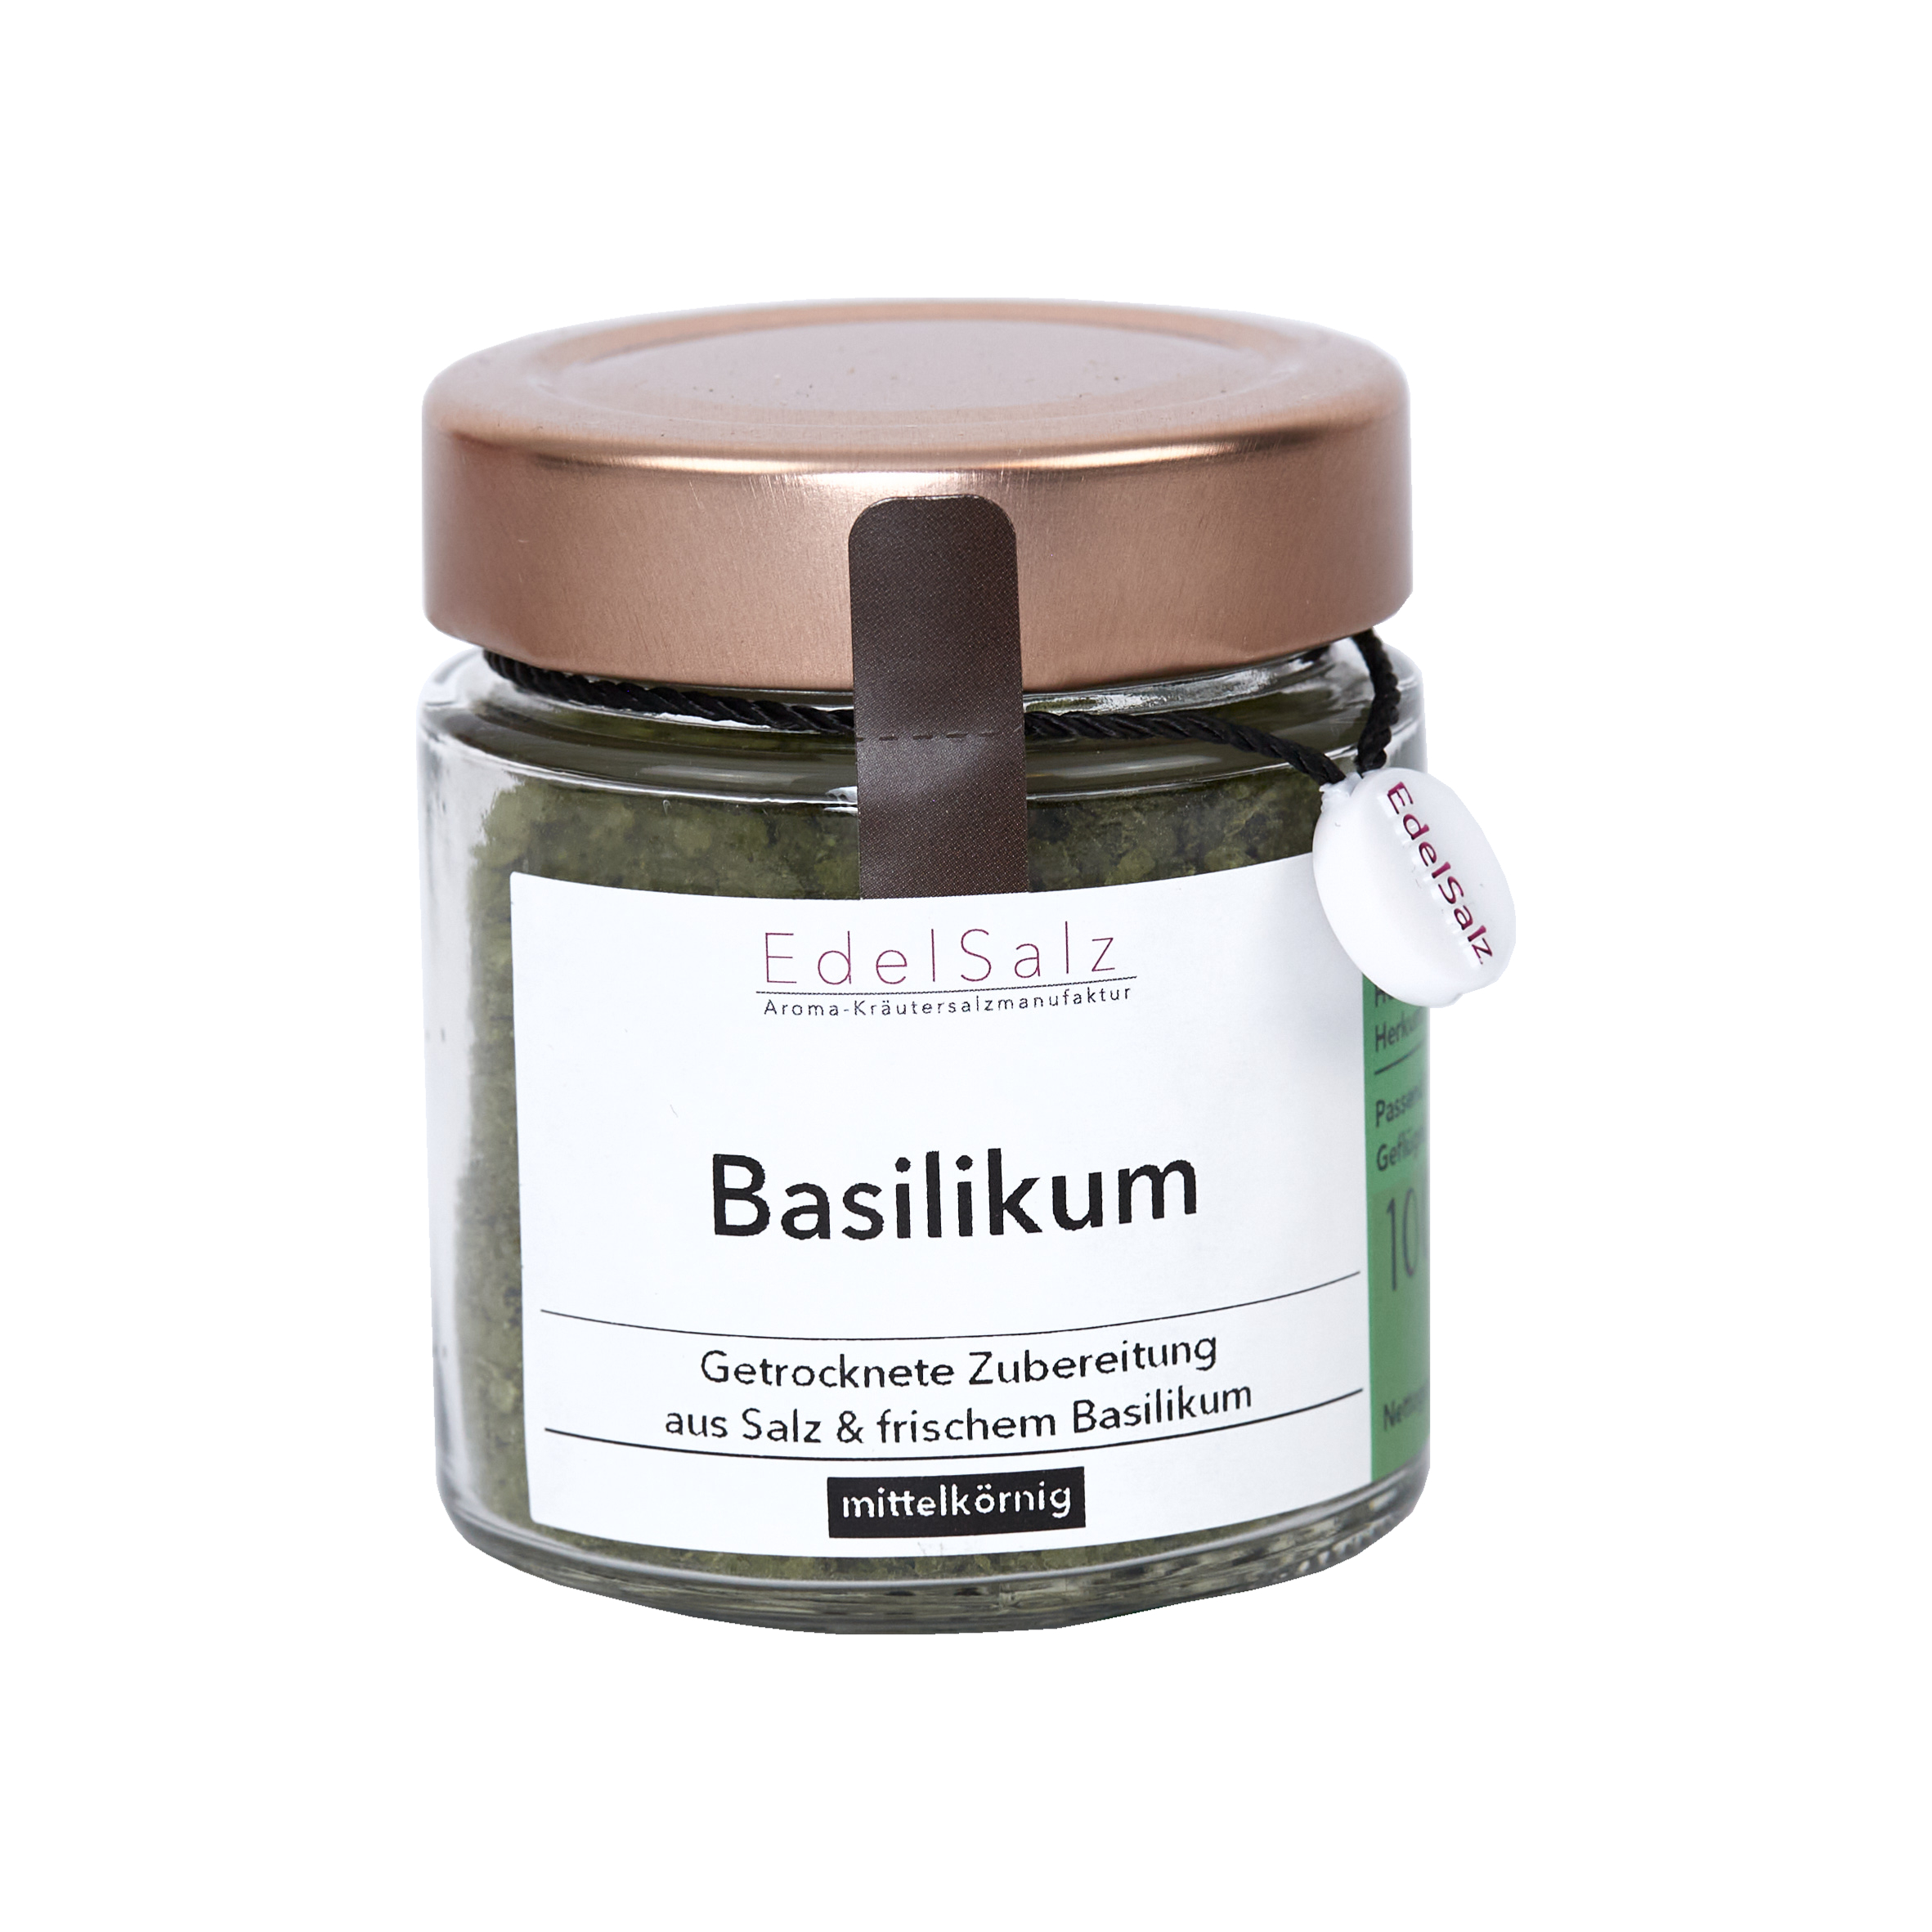 Edelsalz aus der Aroma-Kräutersalzmanufaktur